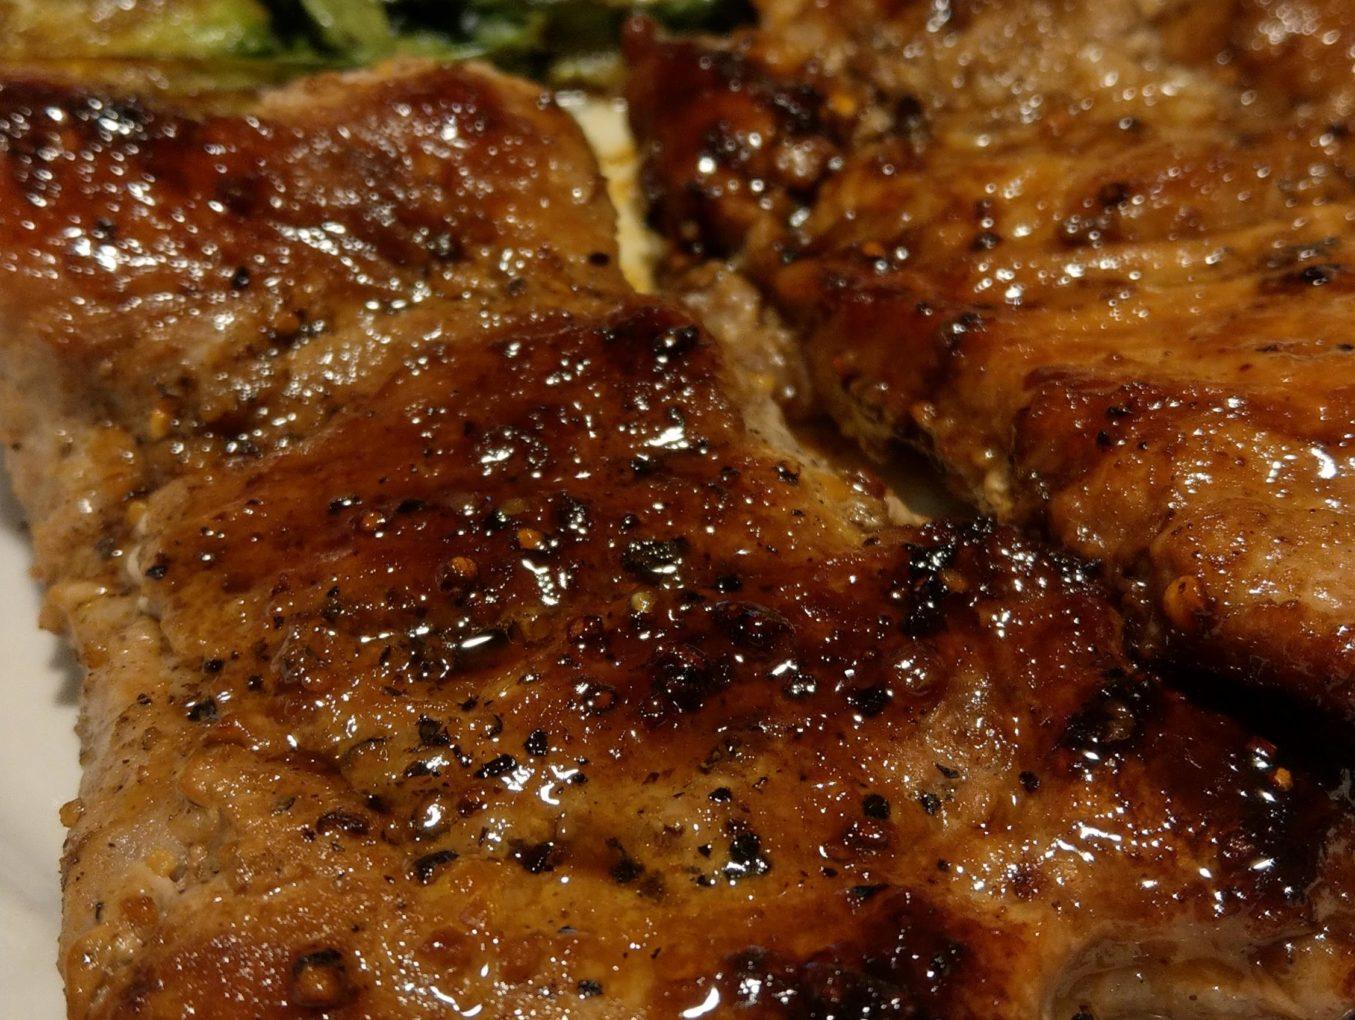 Chipotle honey glazed pork chop